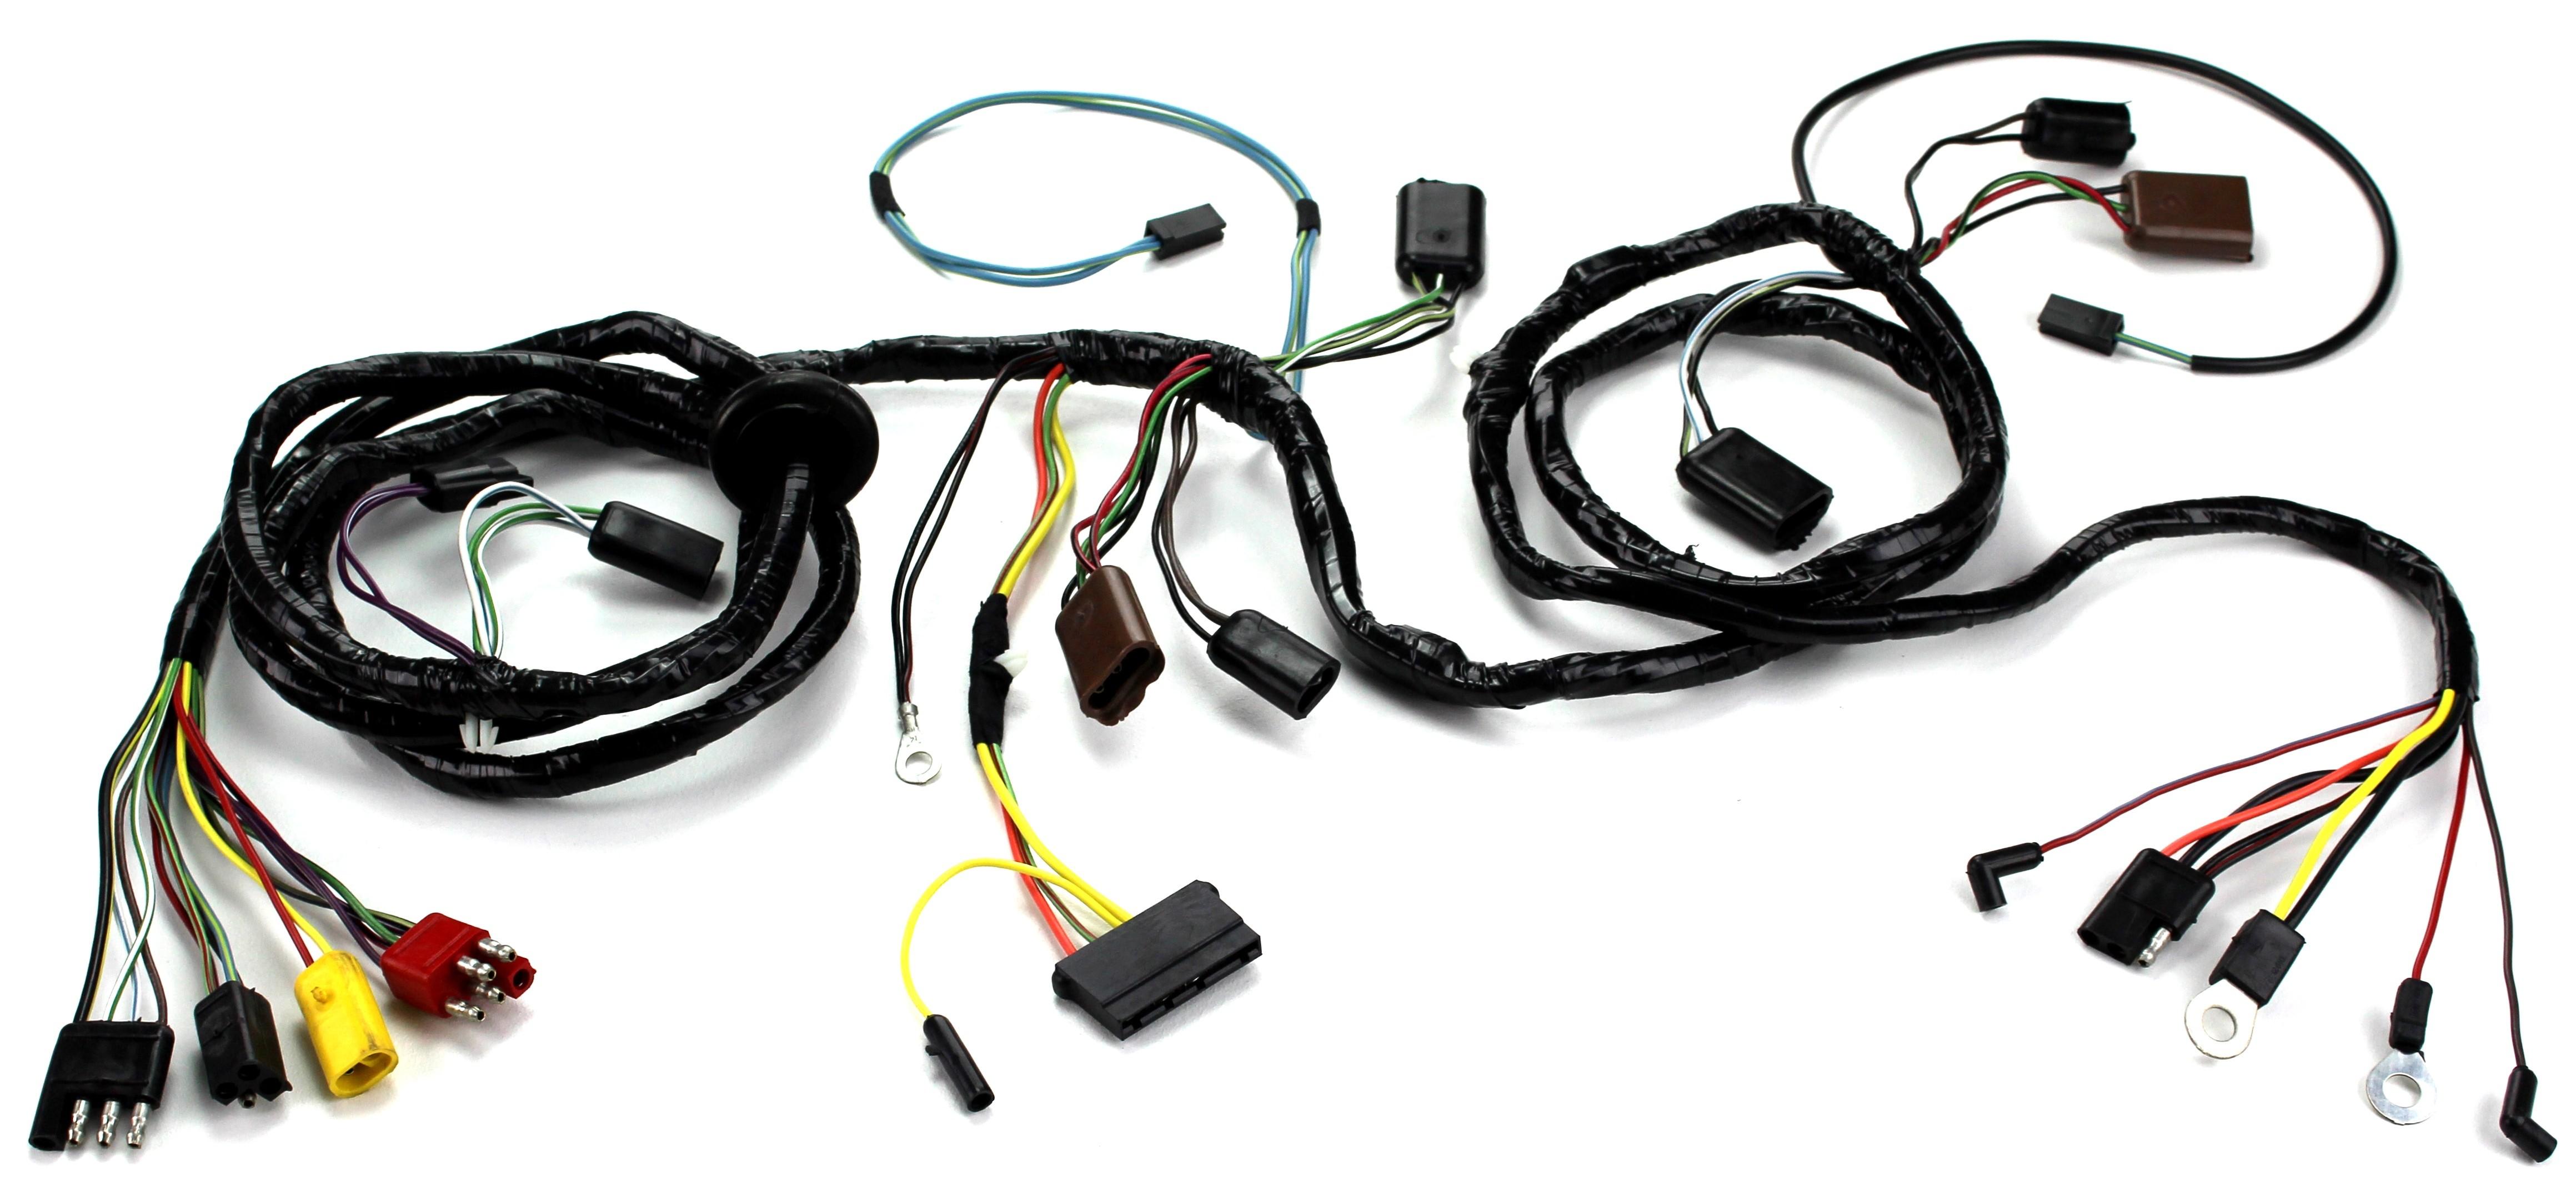 5208 2?1433507604 head light wiring harness w o tach non gt 1968 alloy metal products alloy metal wiring harness at bayanpartner.co